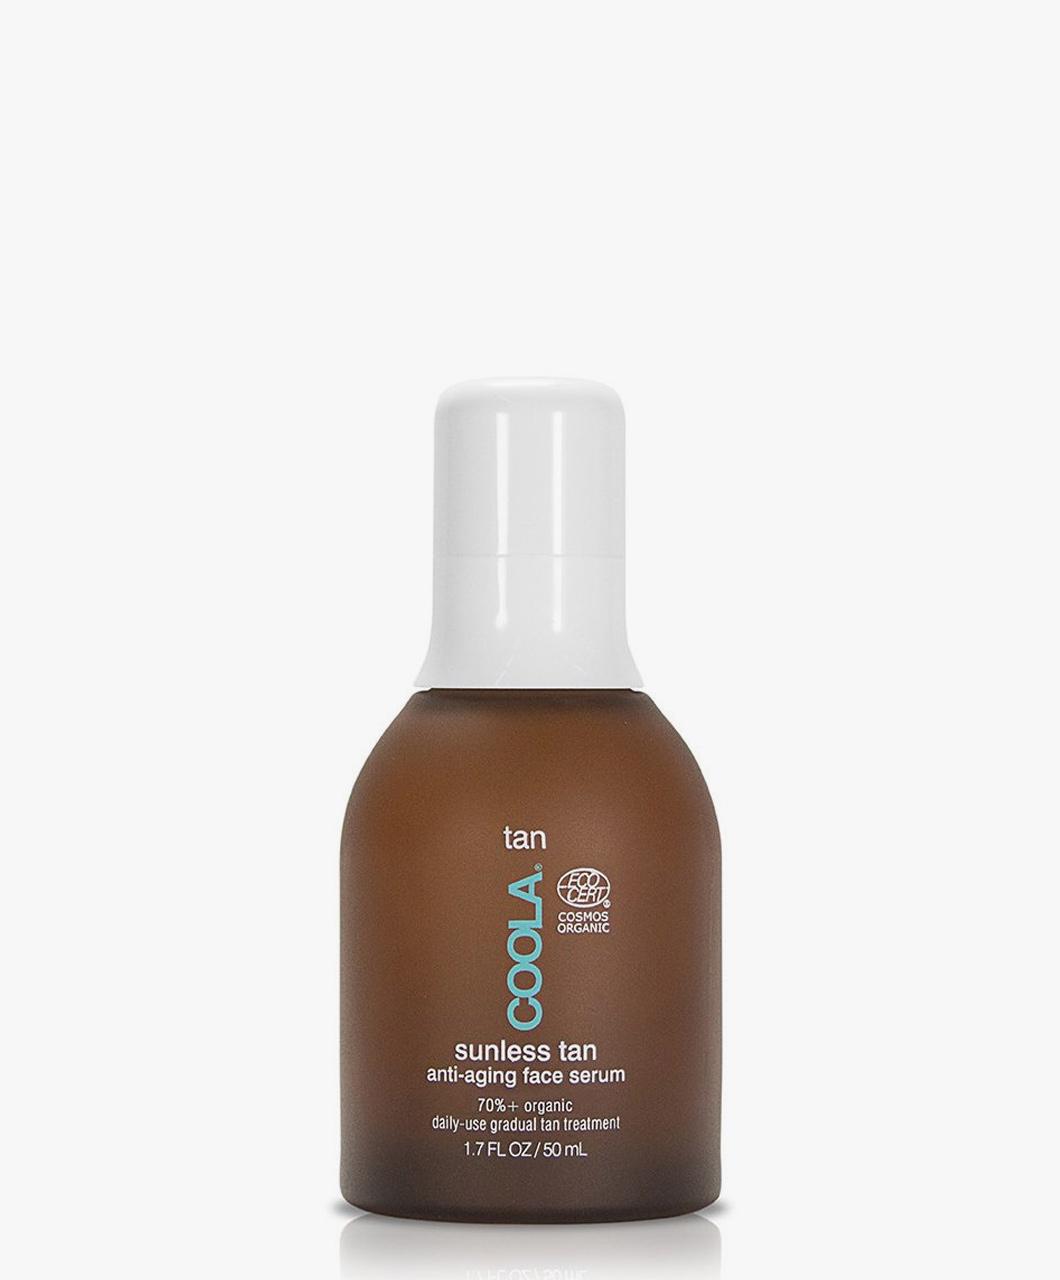 Afbeelding van COOLA Serum Piña Colada Organic Sunless Tan Anti Aging Face